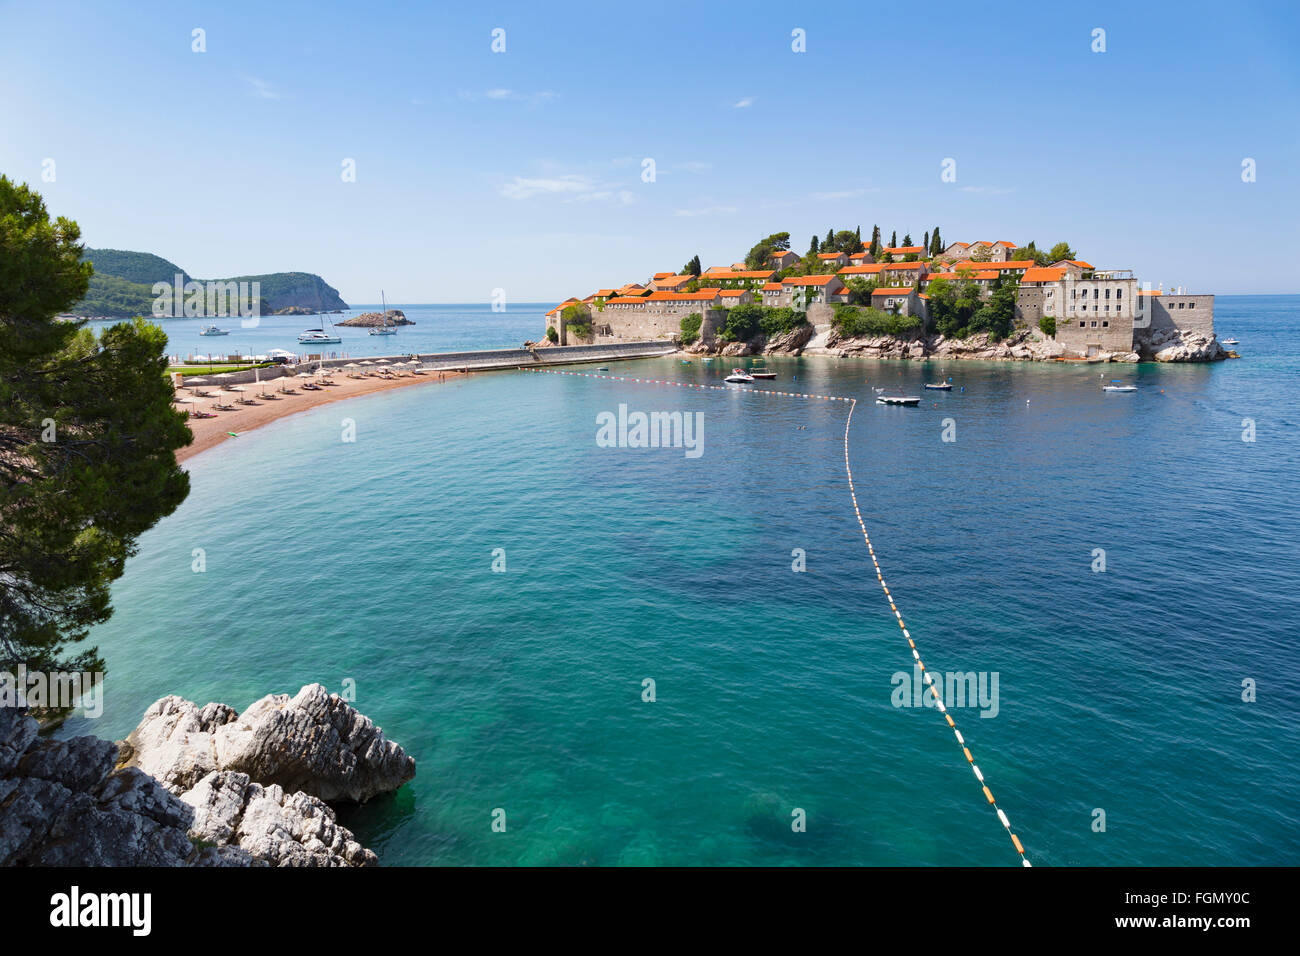 Sveti Stefan, near Budva, Montenegro. Stock Photo